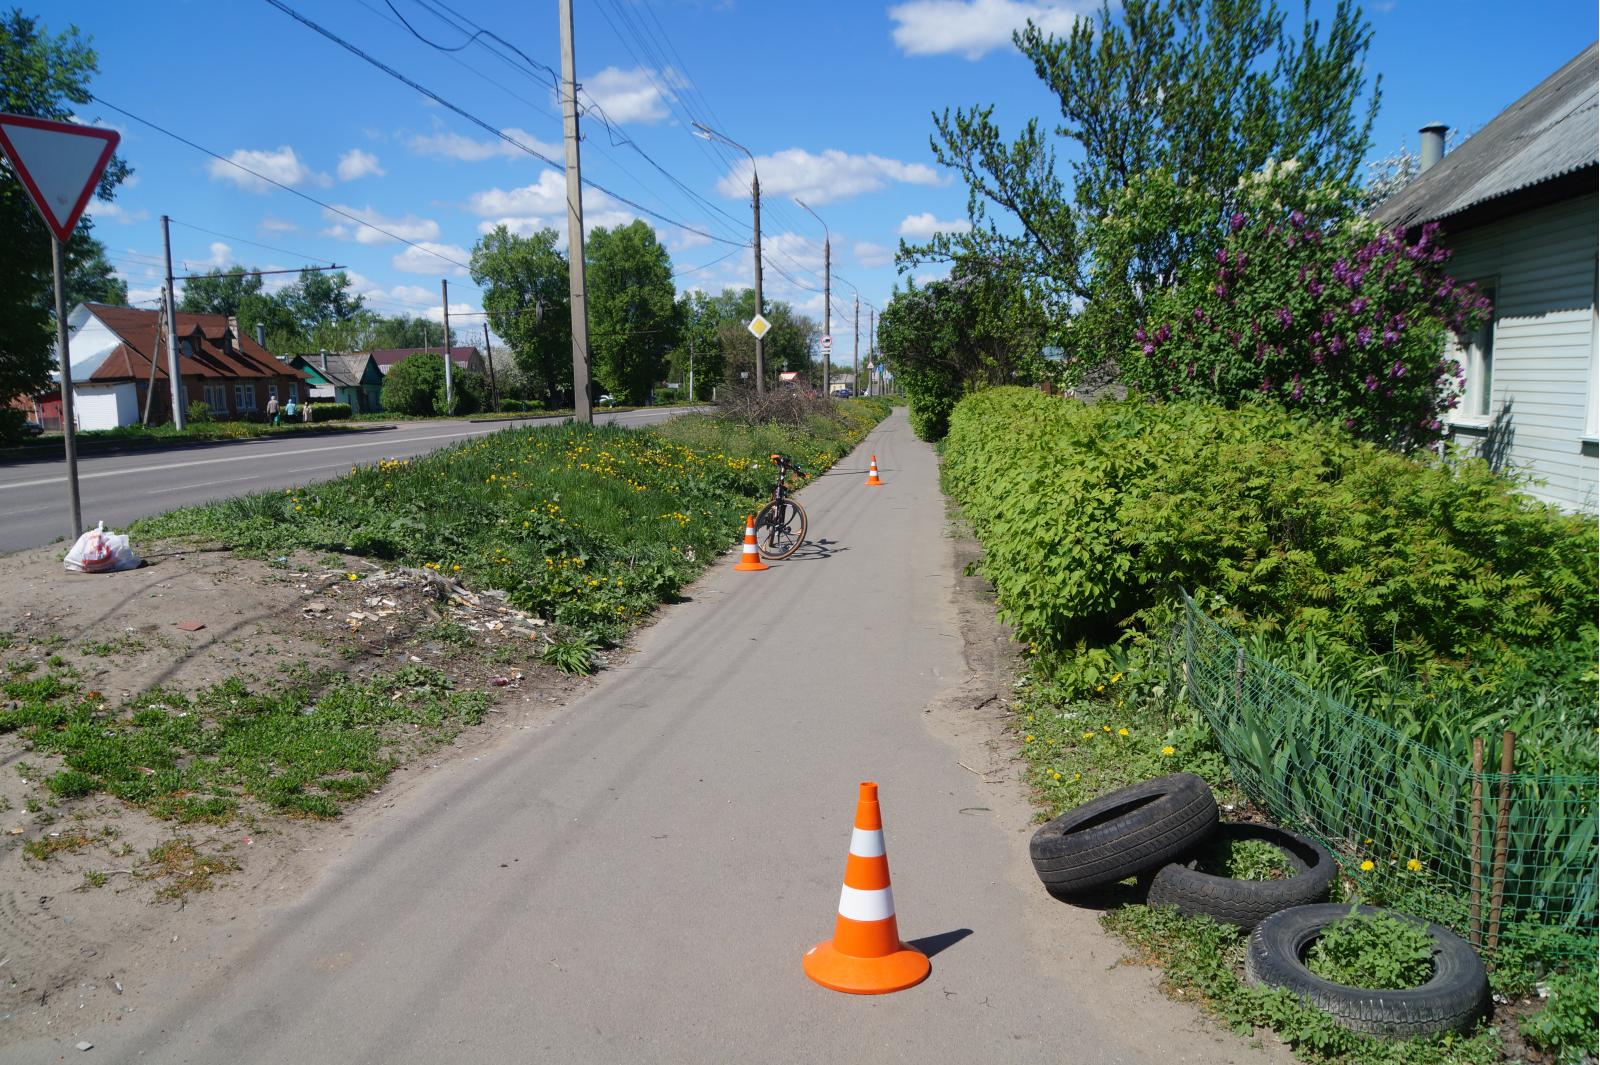 Велосипедист, сбил пешехода, конус